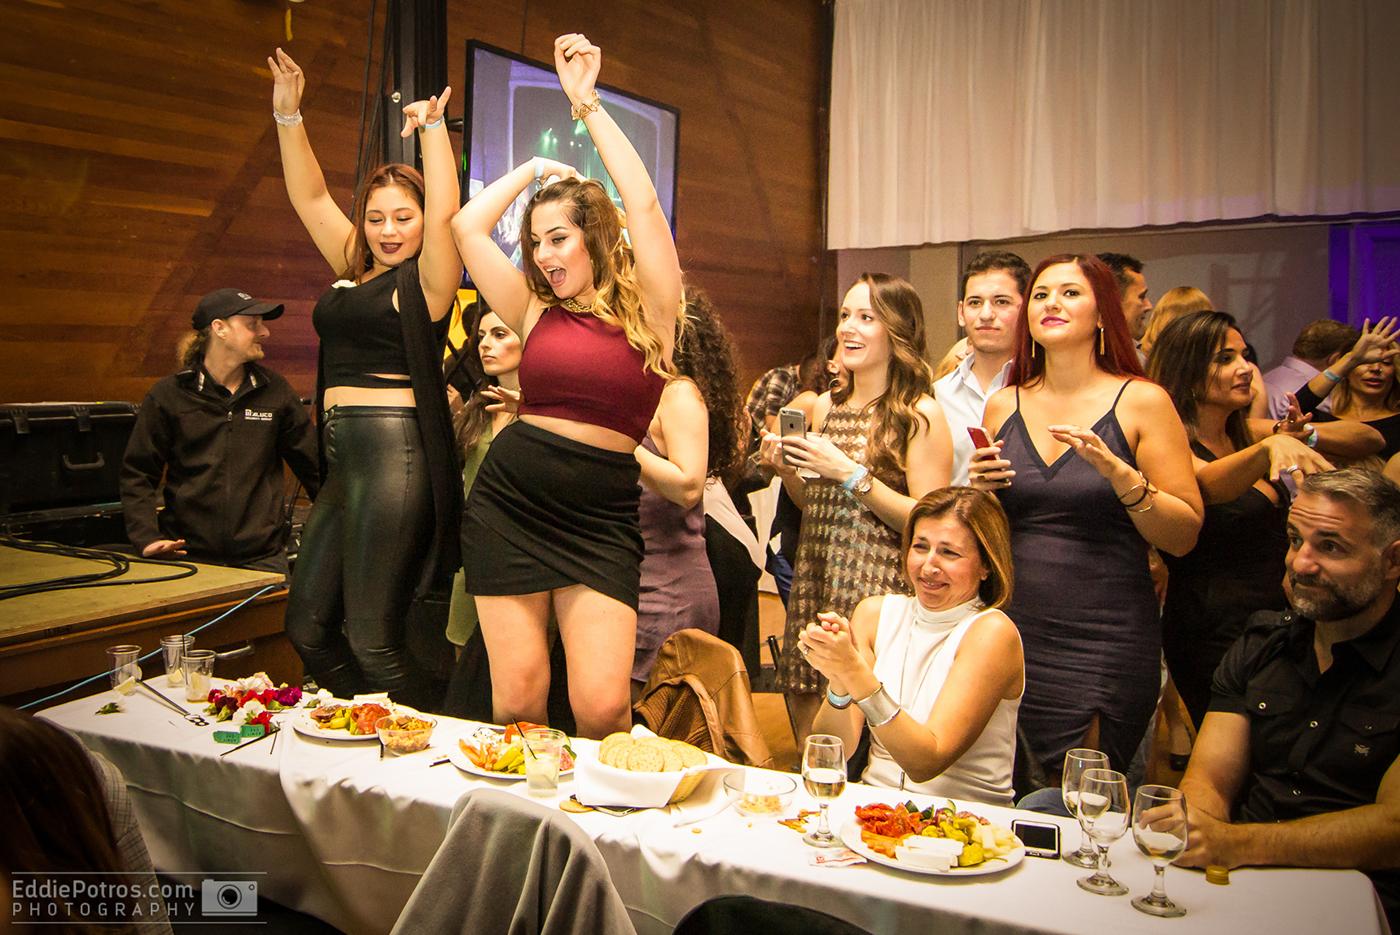 Photography  concert greek concert photography eddie potros e11world event photography Party Photography Greek community despina vandi